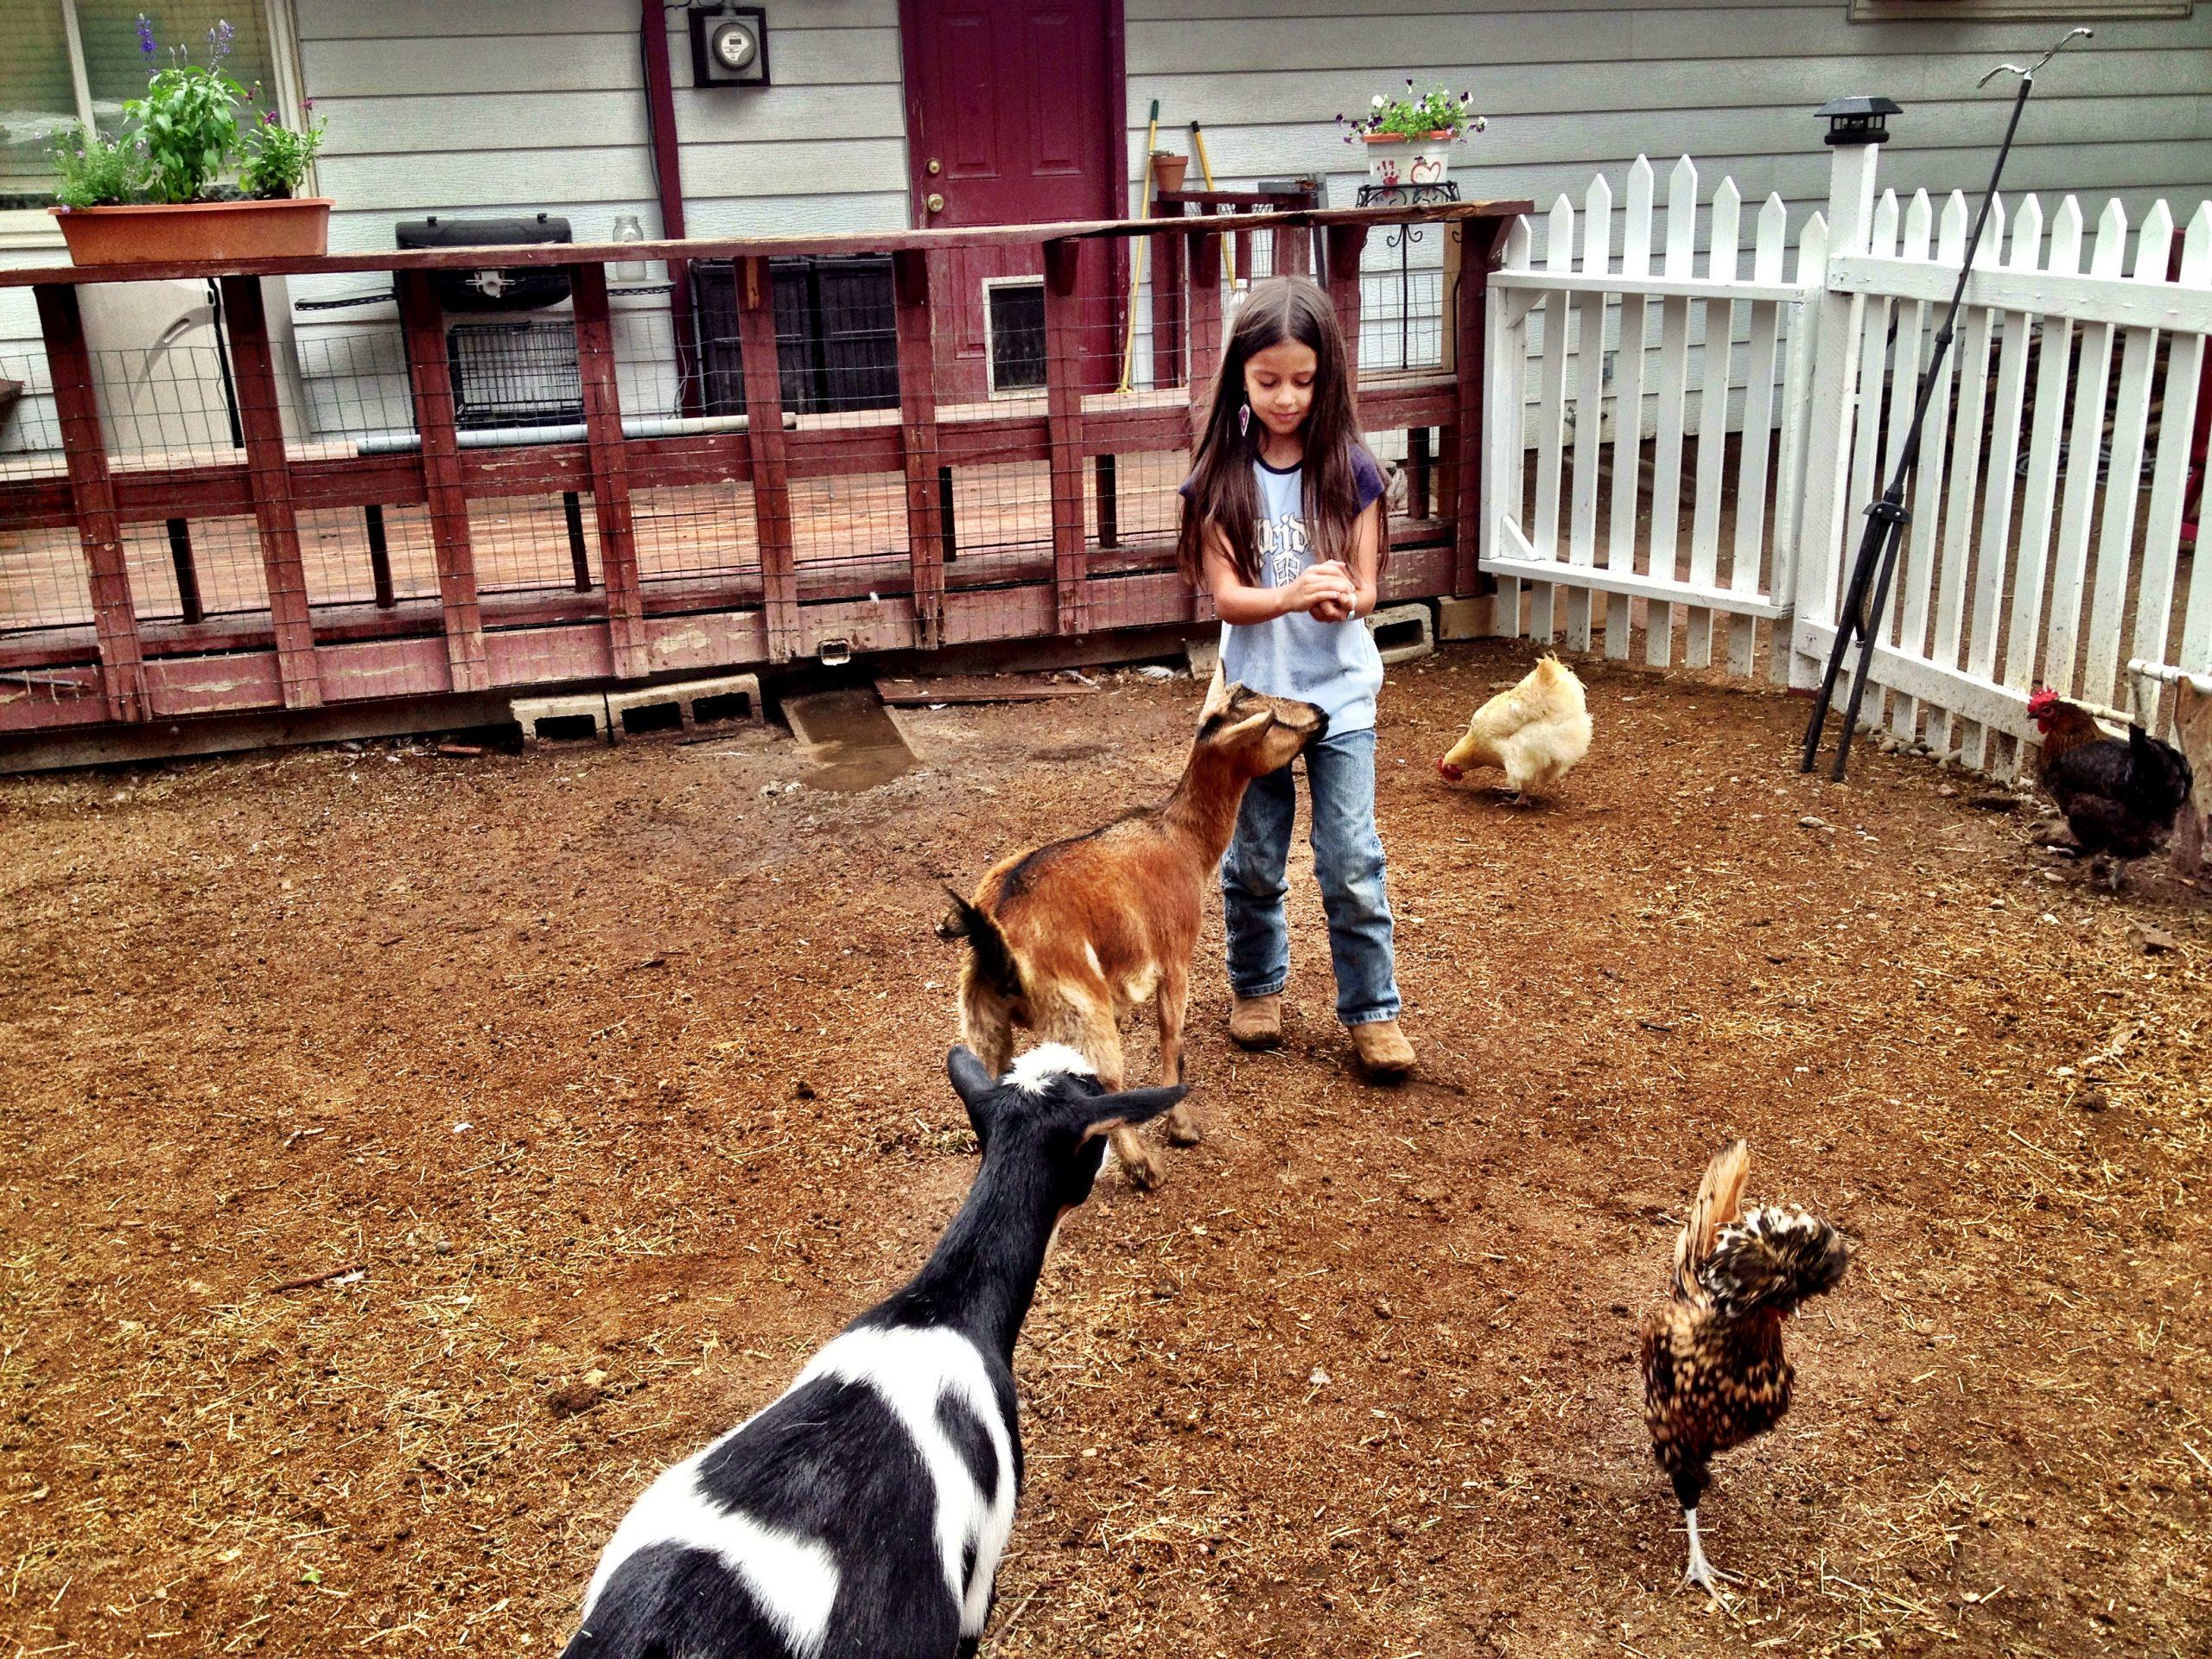 8-year-old Isabella with urban farm animals